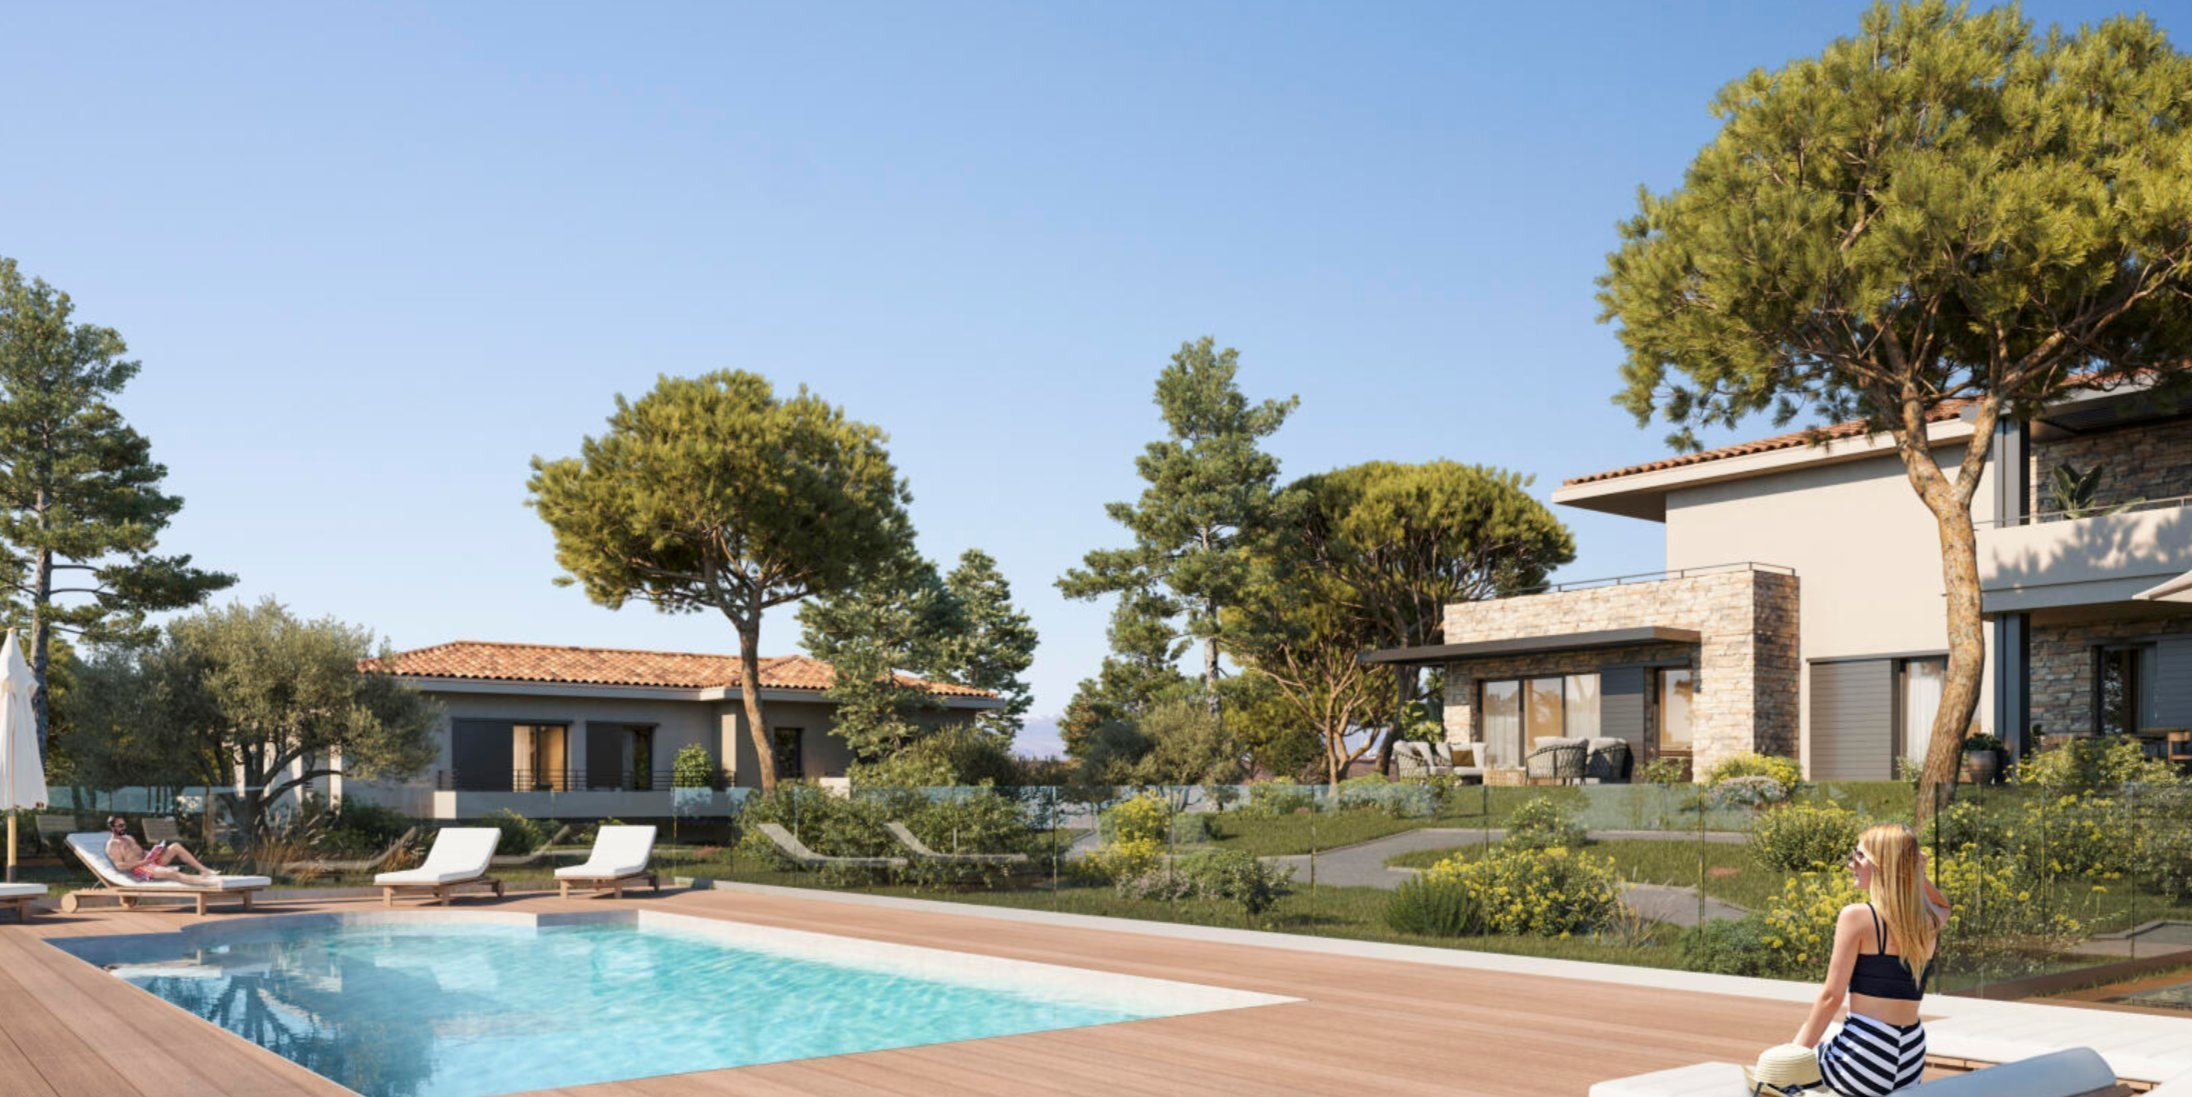 * New * New apartment in Sainte-Maxime